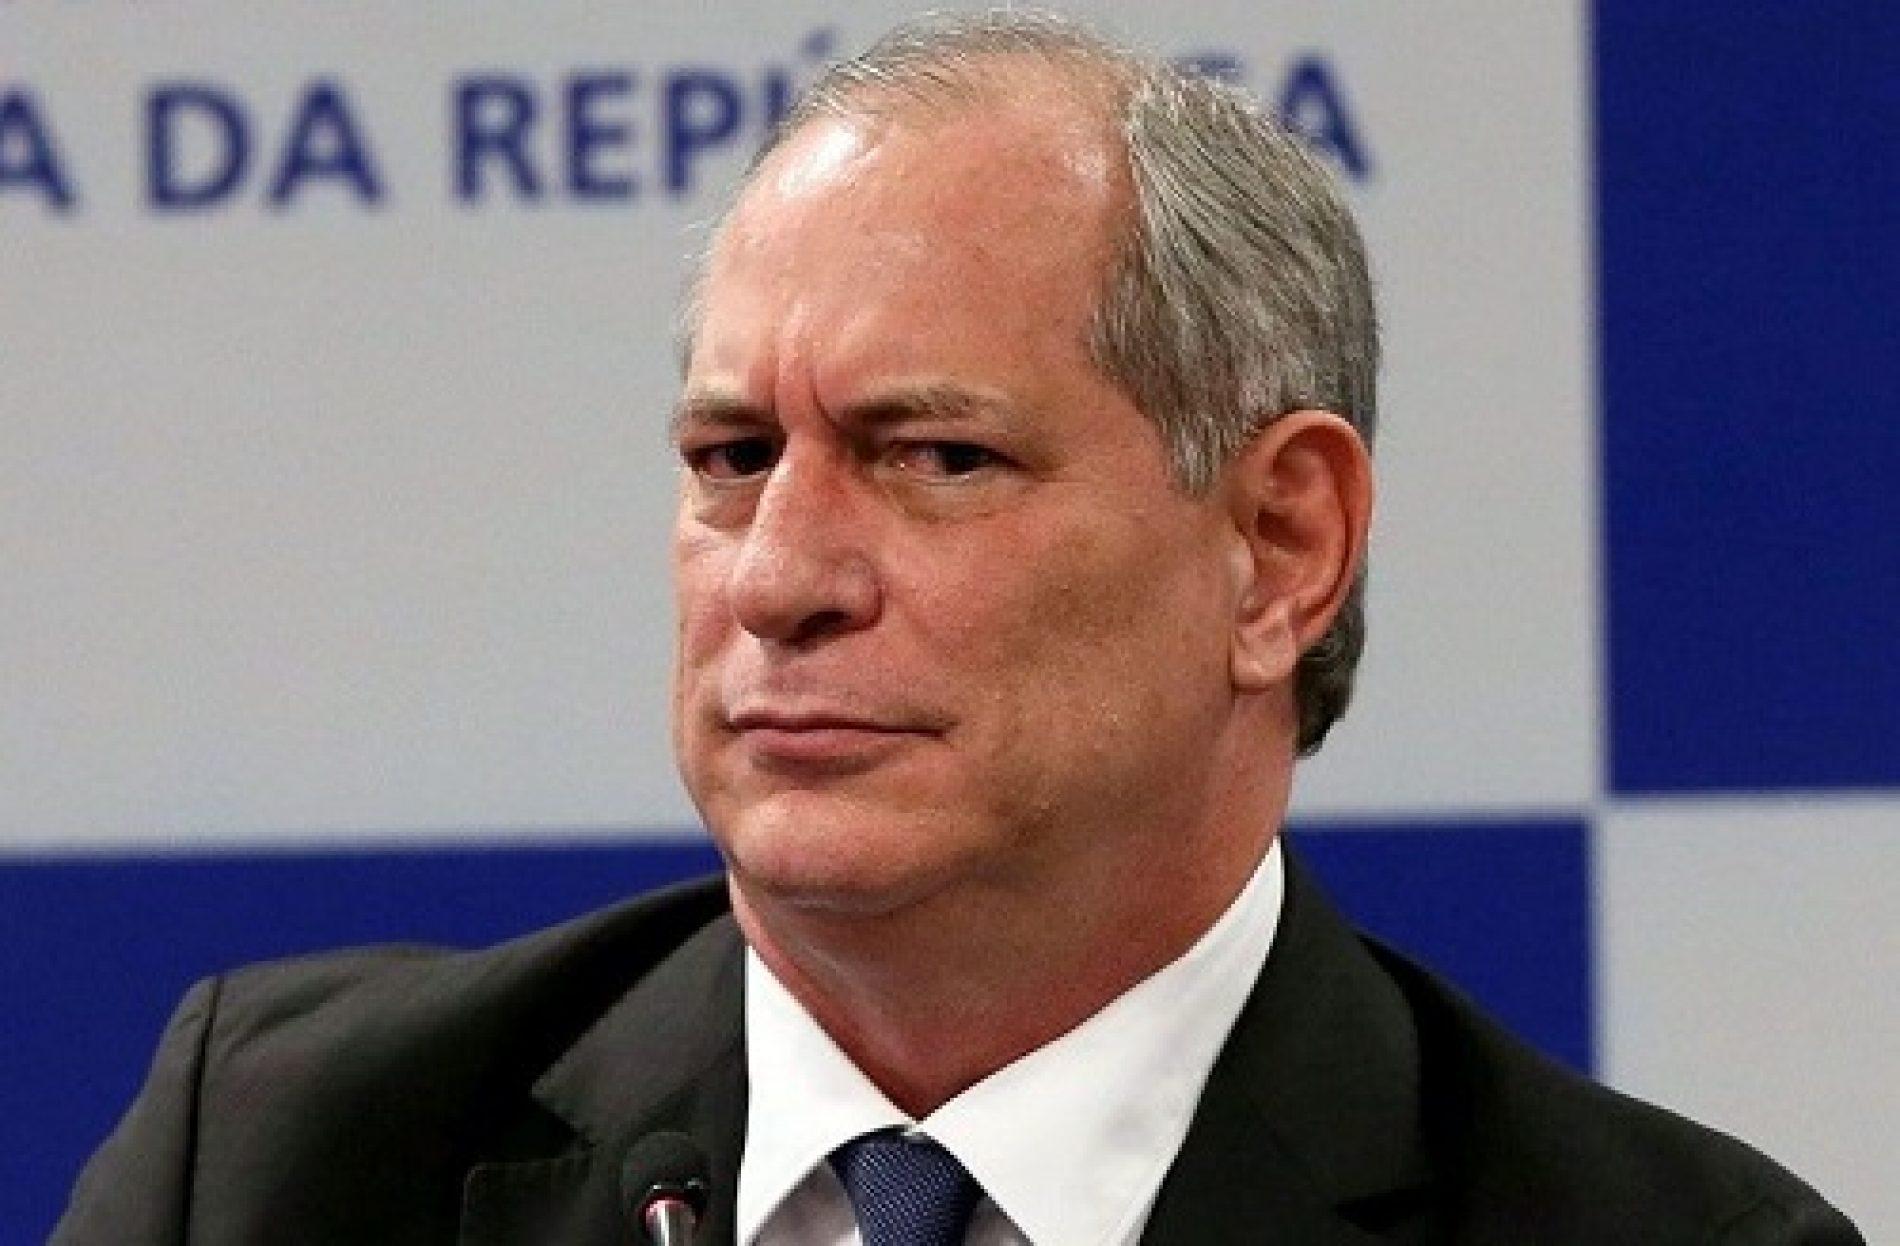 Ciro também vai ao ringue das redes sociais contra Bolsonaro